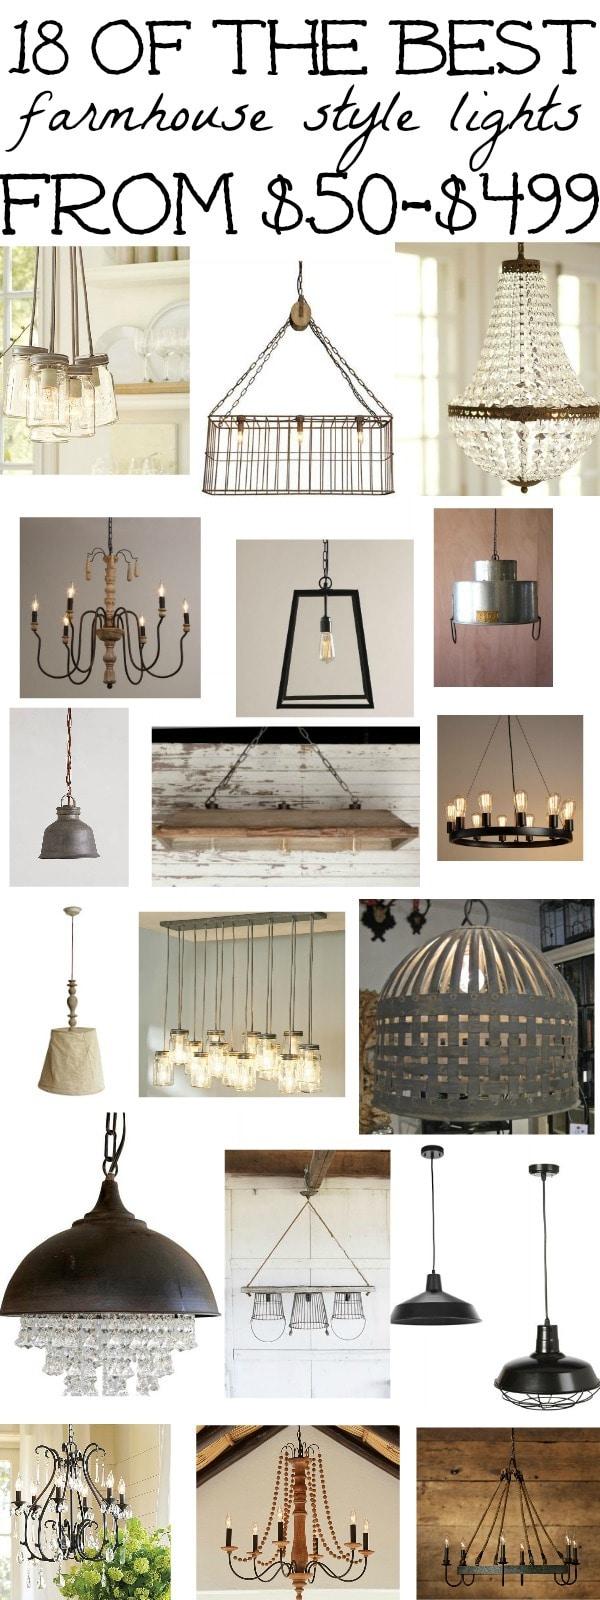 18 of the best farmhouse light fixtures